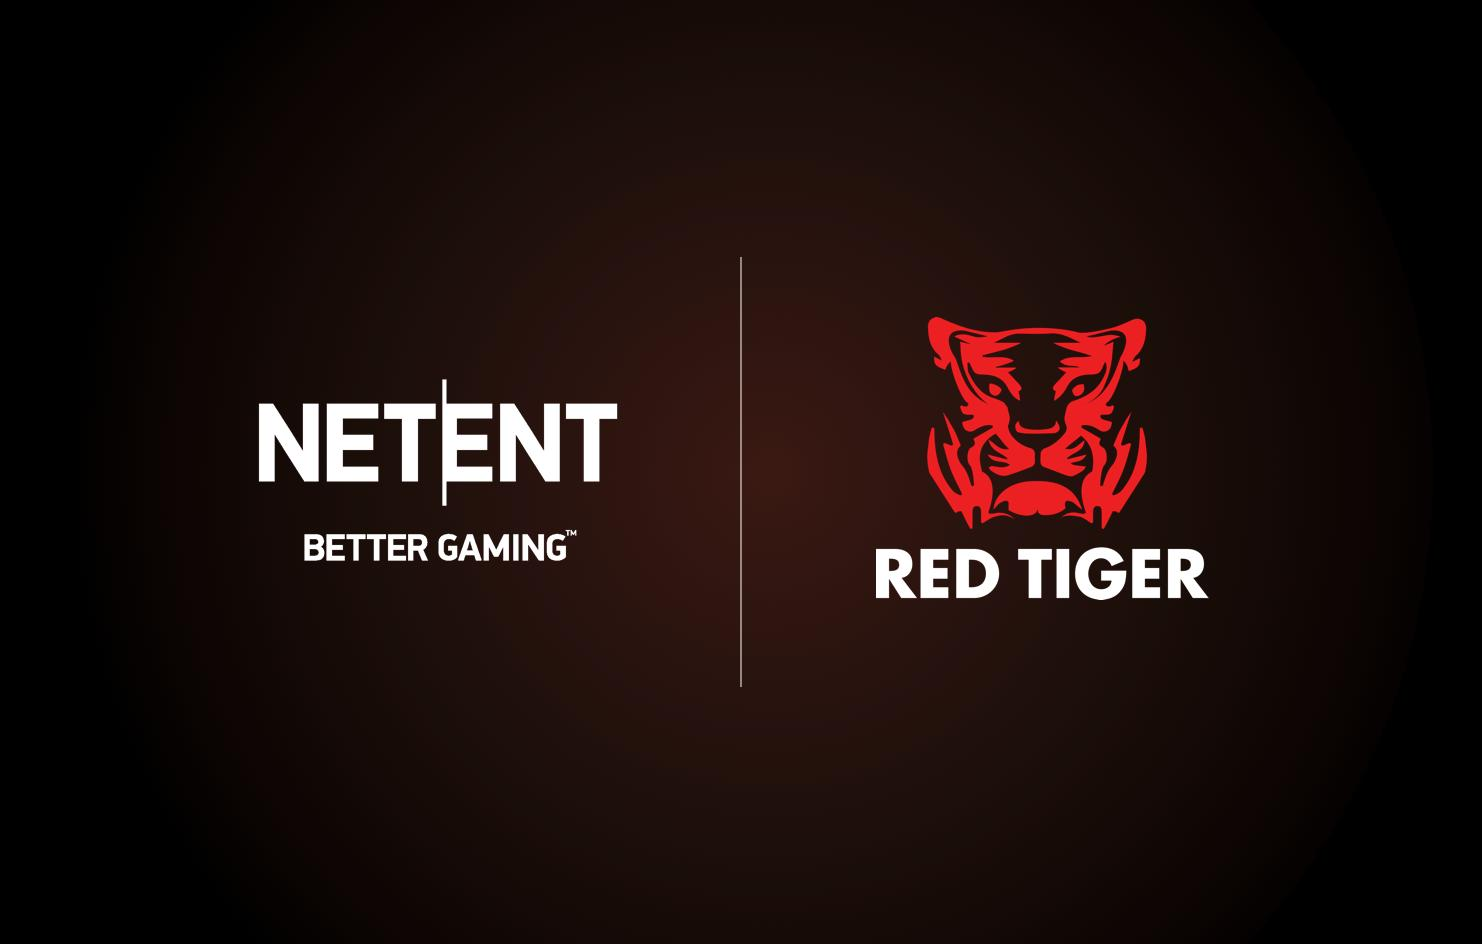 Red Tiger Logo, NetEnt Logo